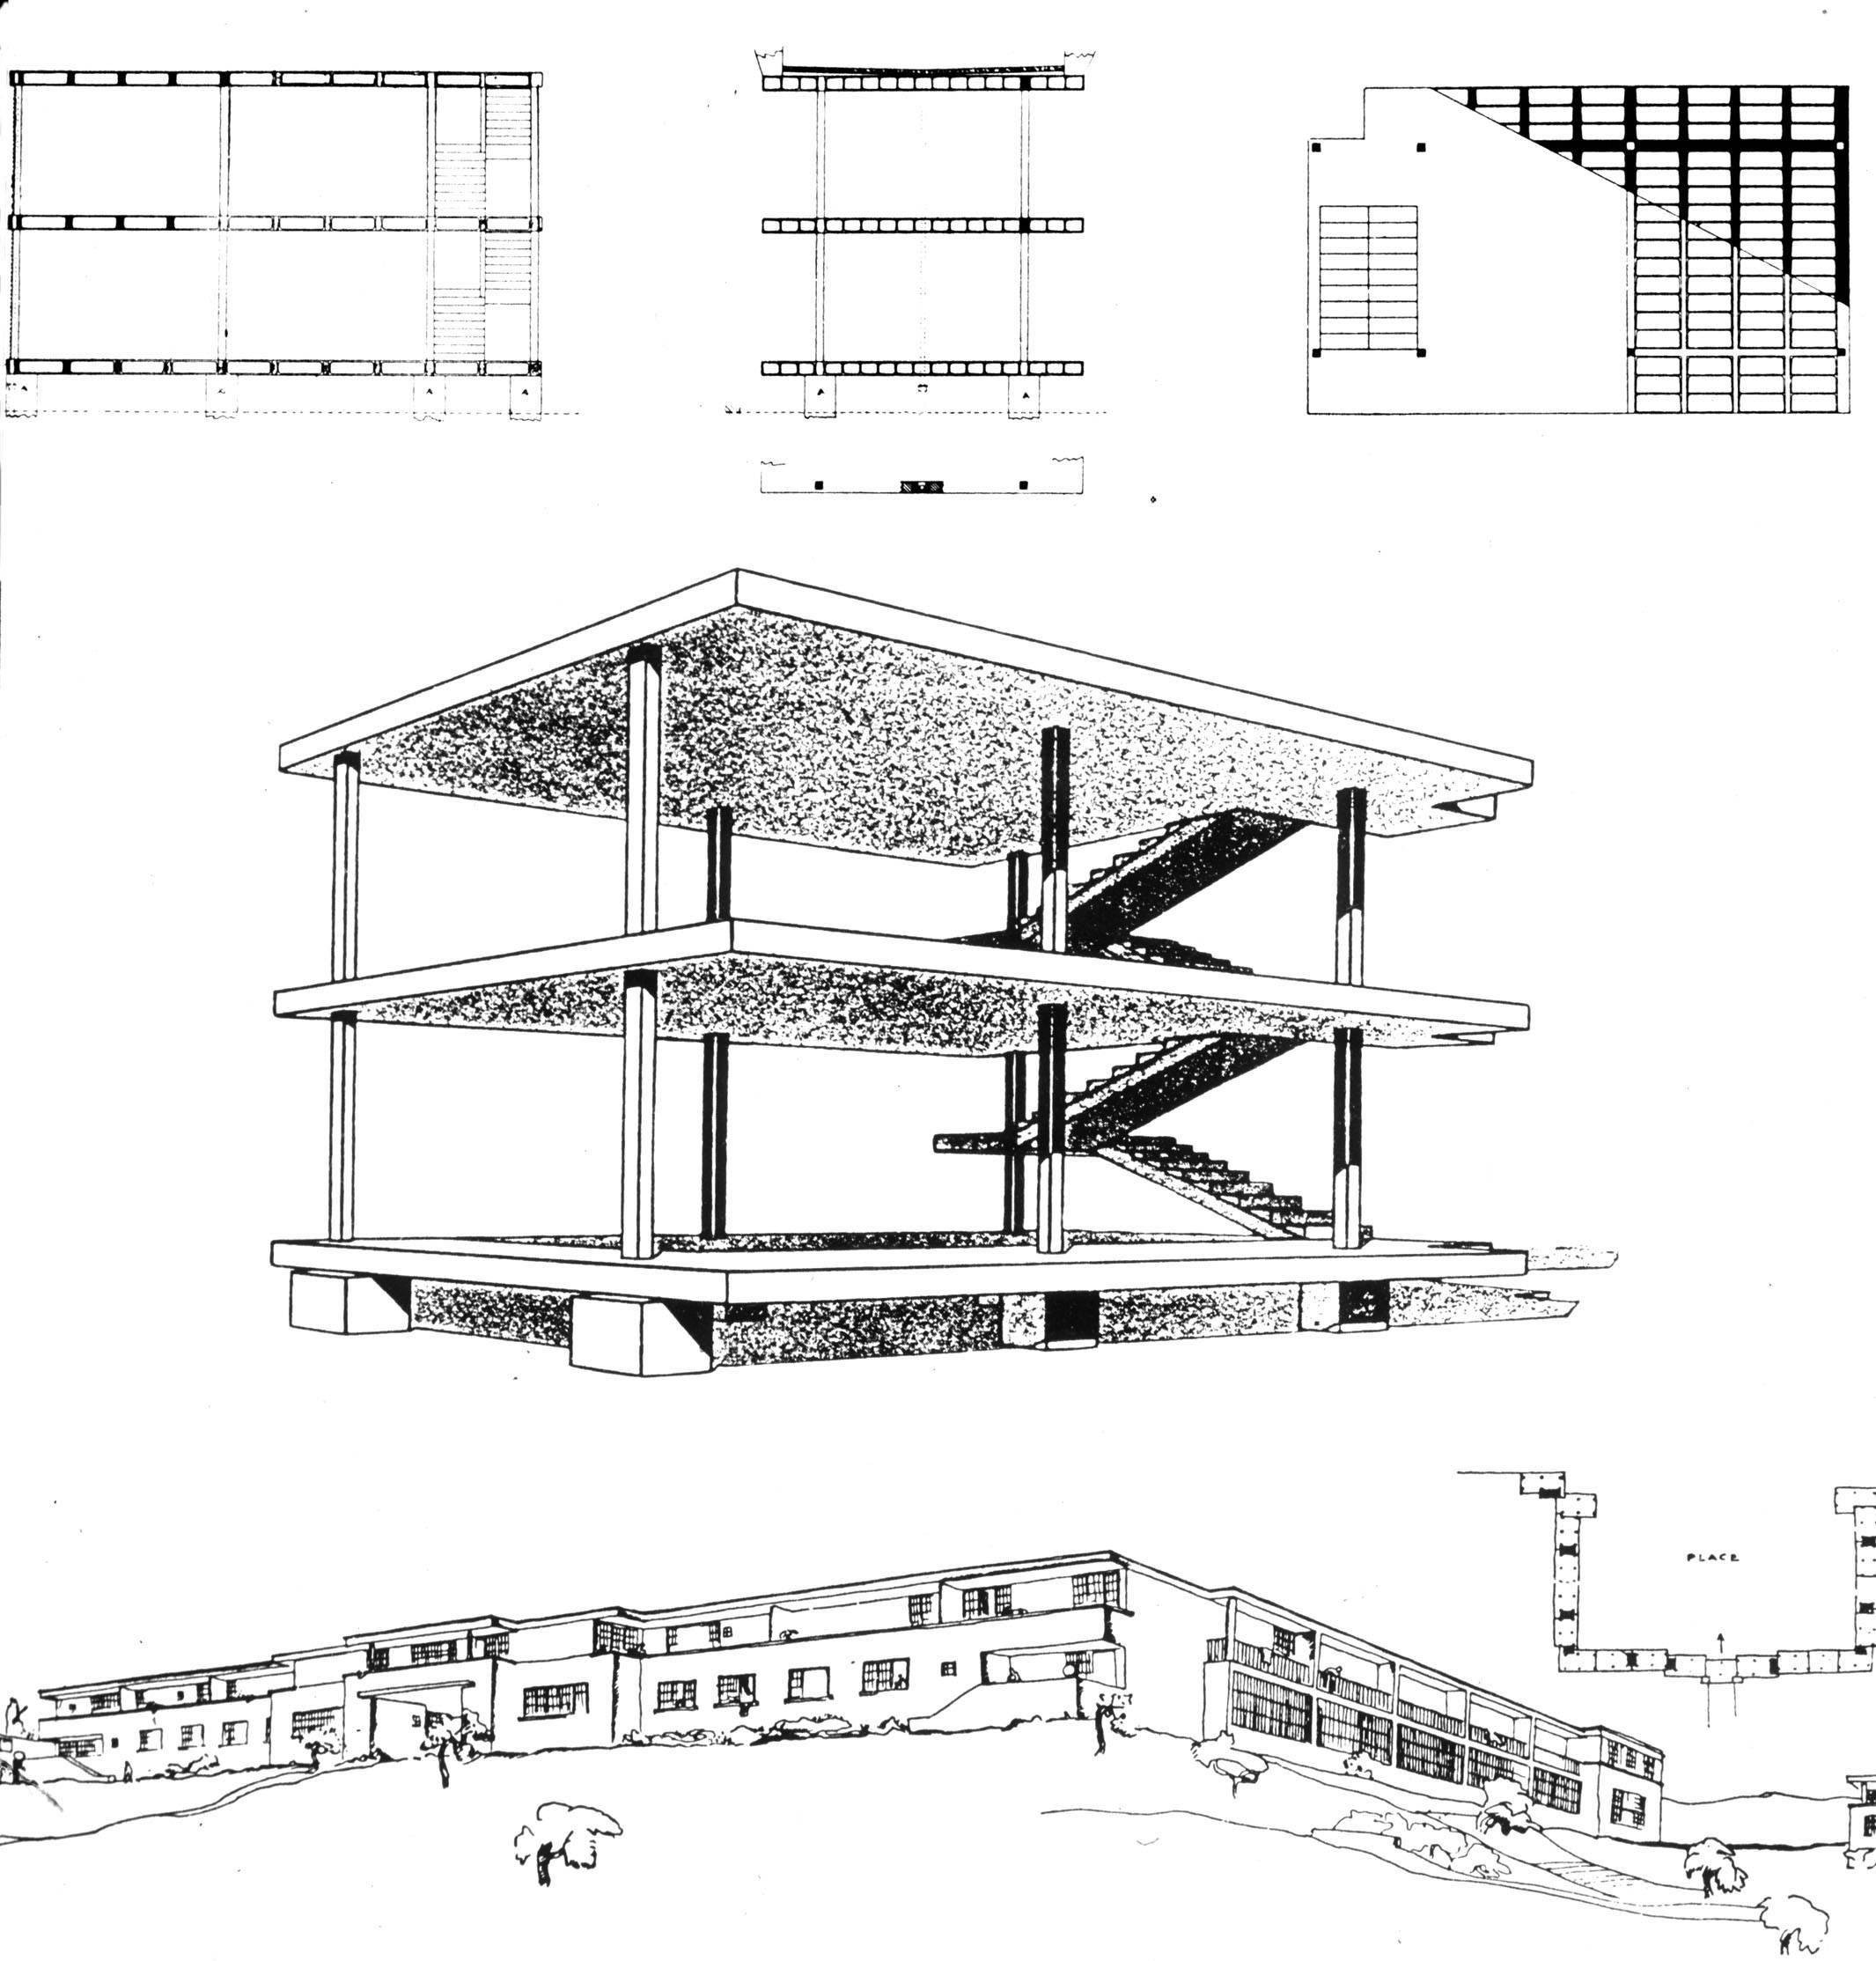 Le corbusier maison domino 1915 arch427 week5 for Maison domino